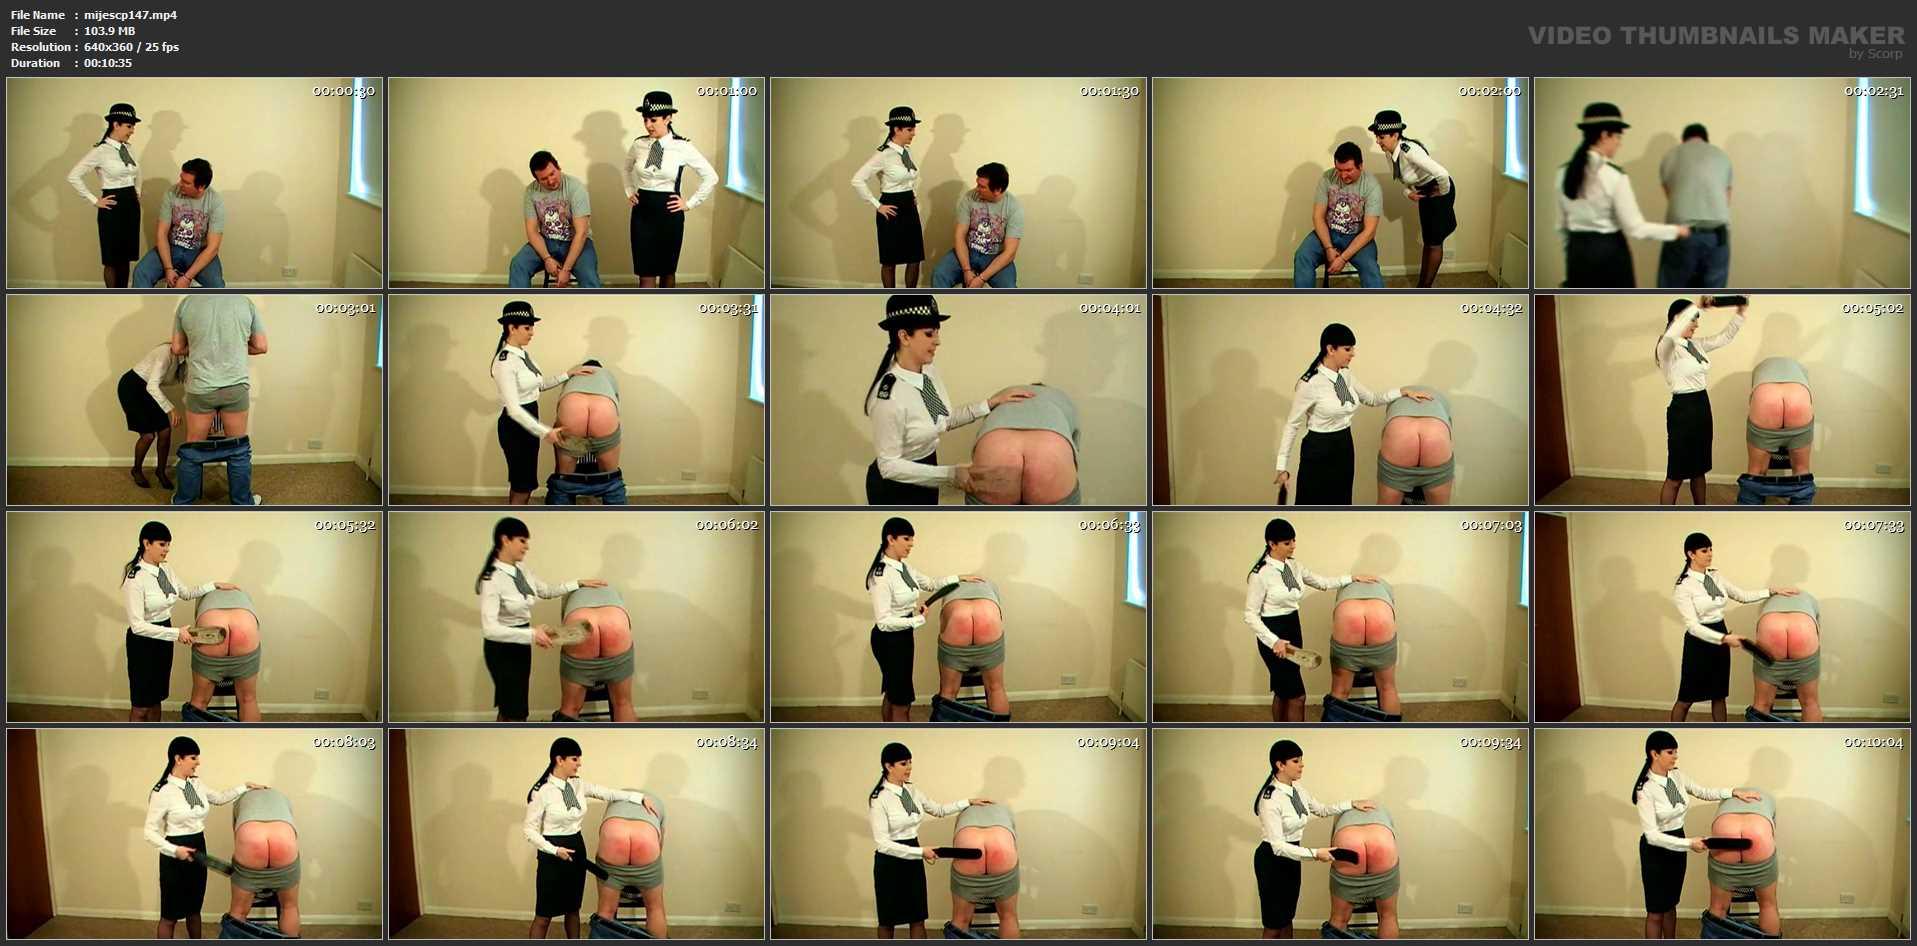 Jessica Wood In Scene: Car thief - MISSJESSICAWOODVIDEOS - LQ/360p/MP4